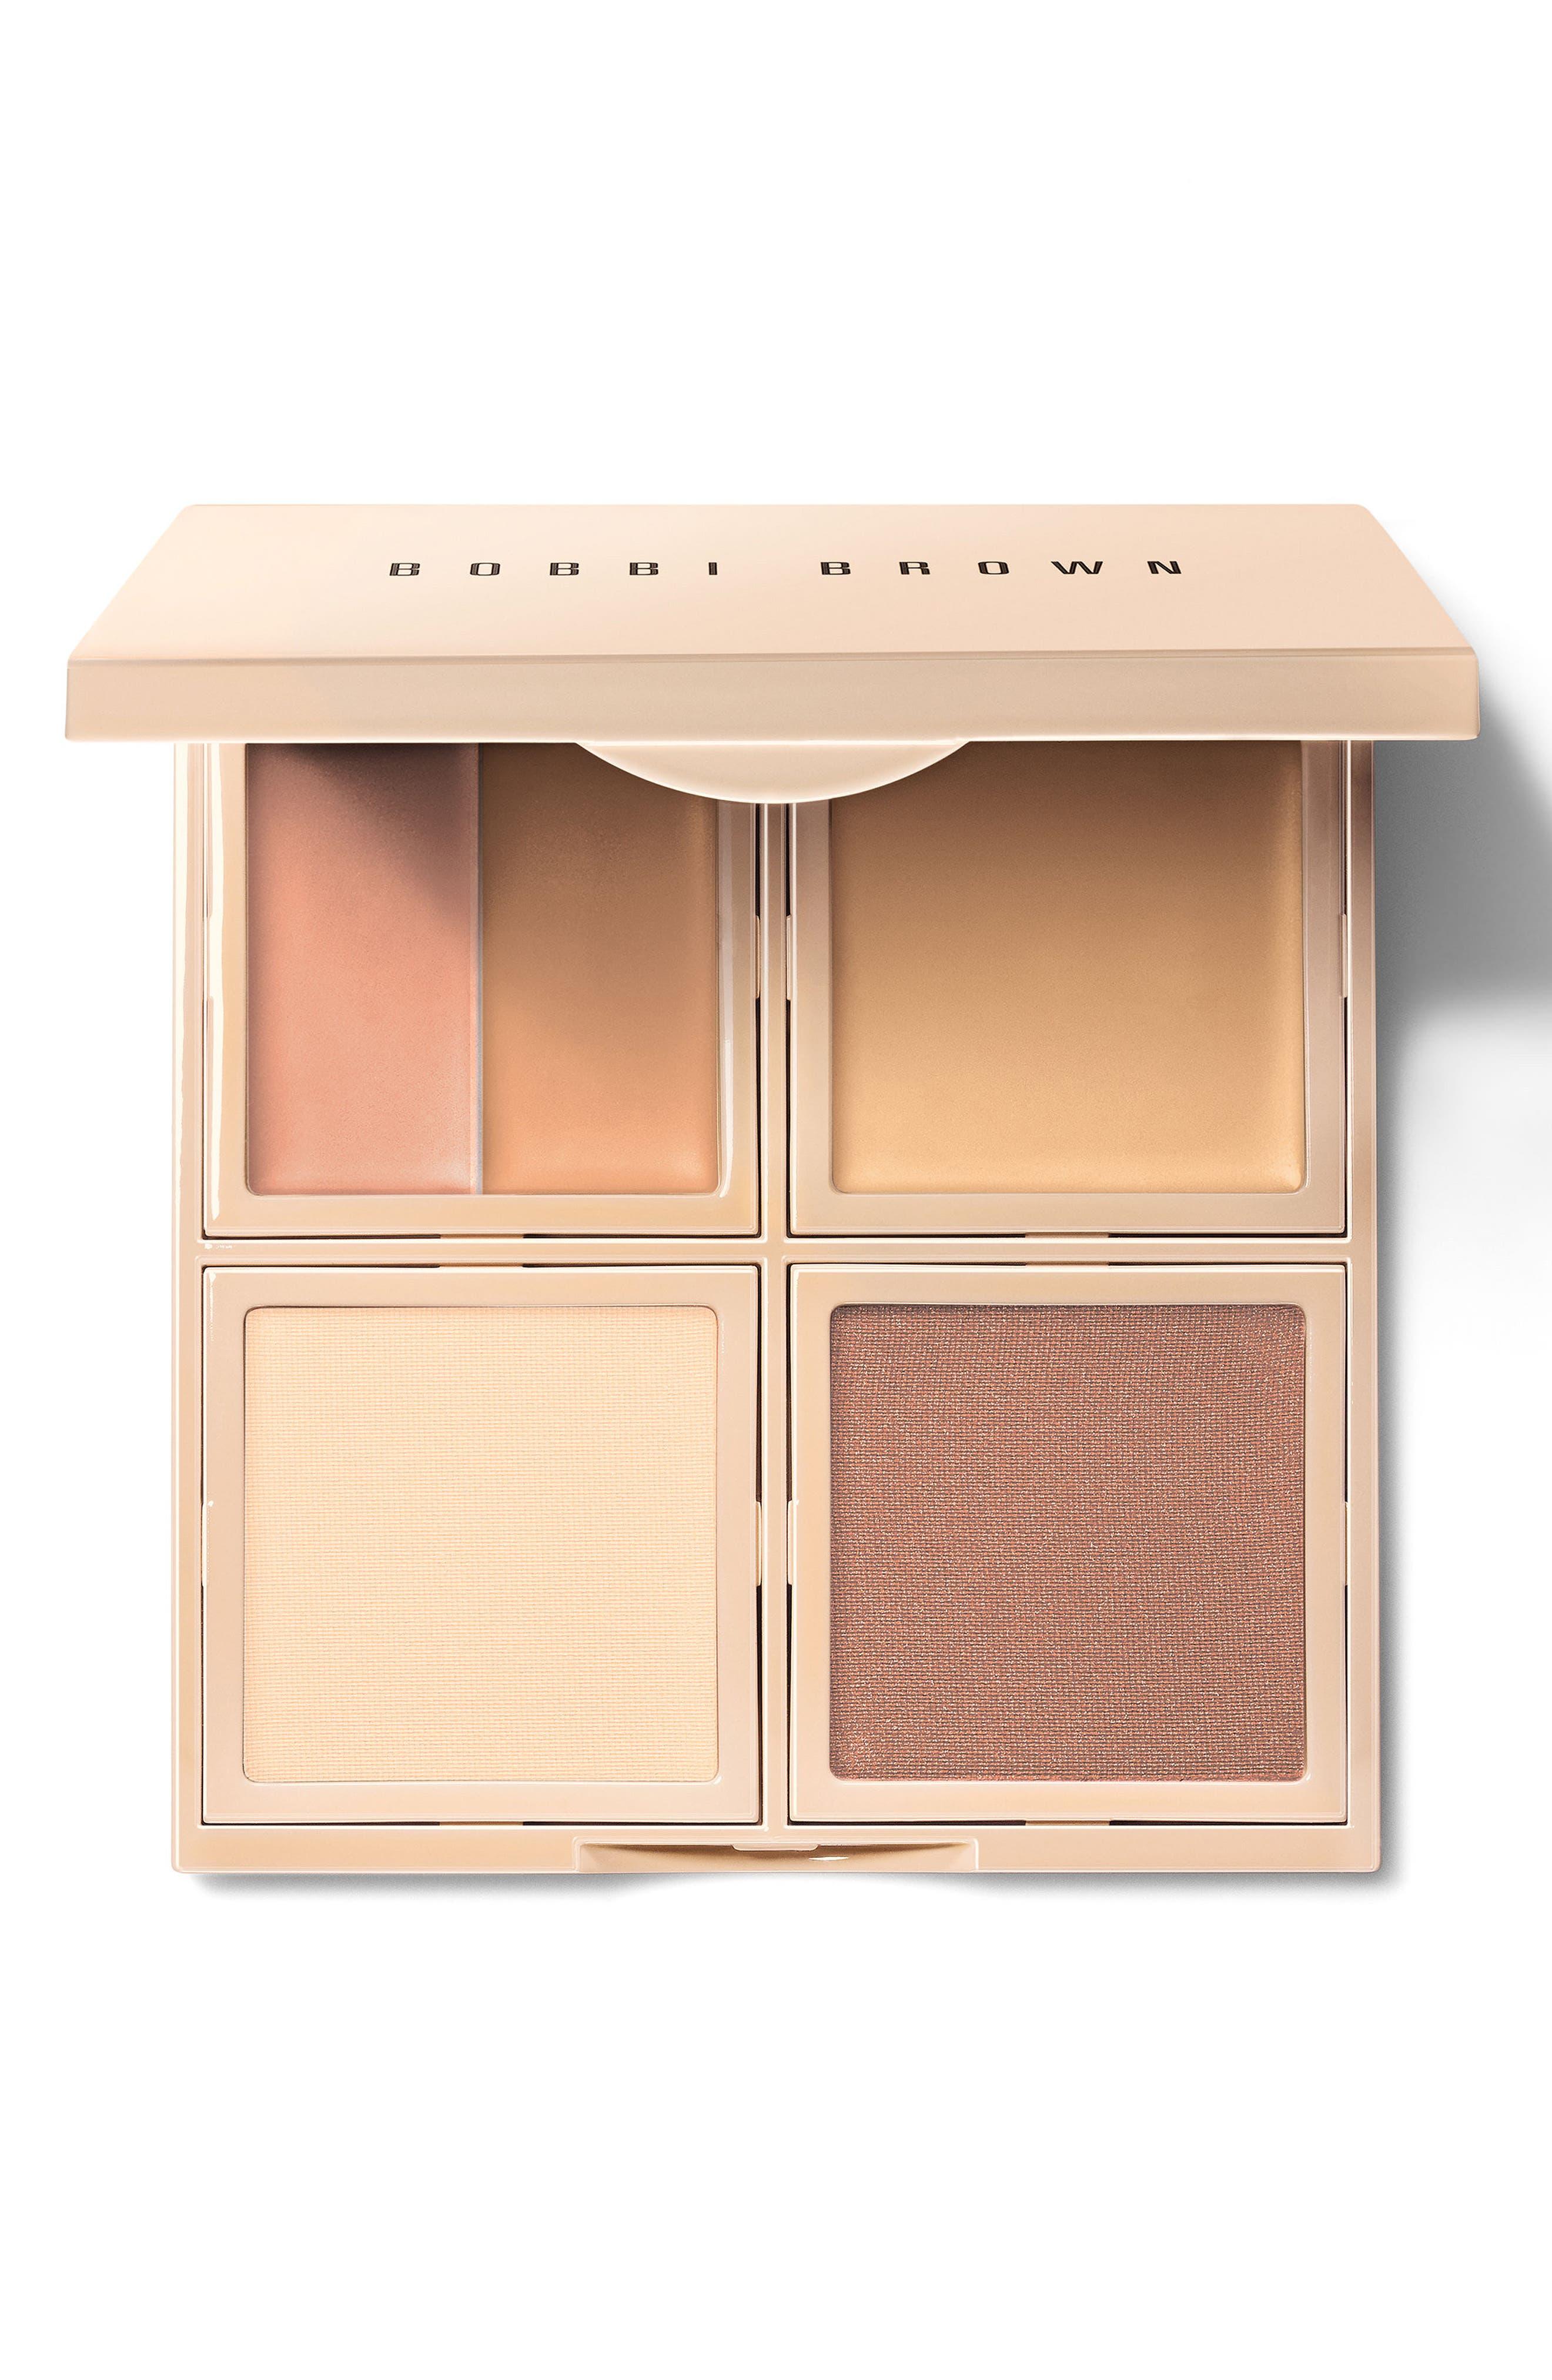 Bobbi Brown 5-in-1 Essential Face Palette (Nordstrom Exclusive) ($135 Value)